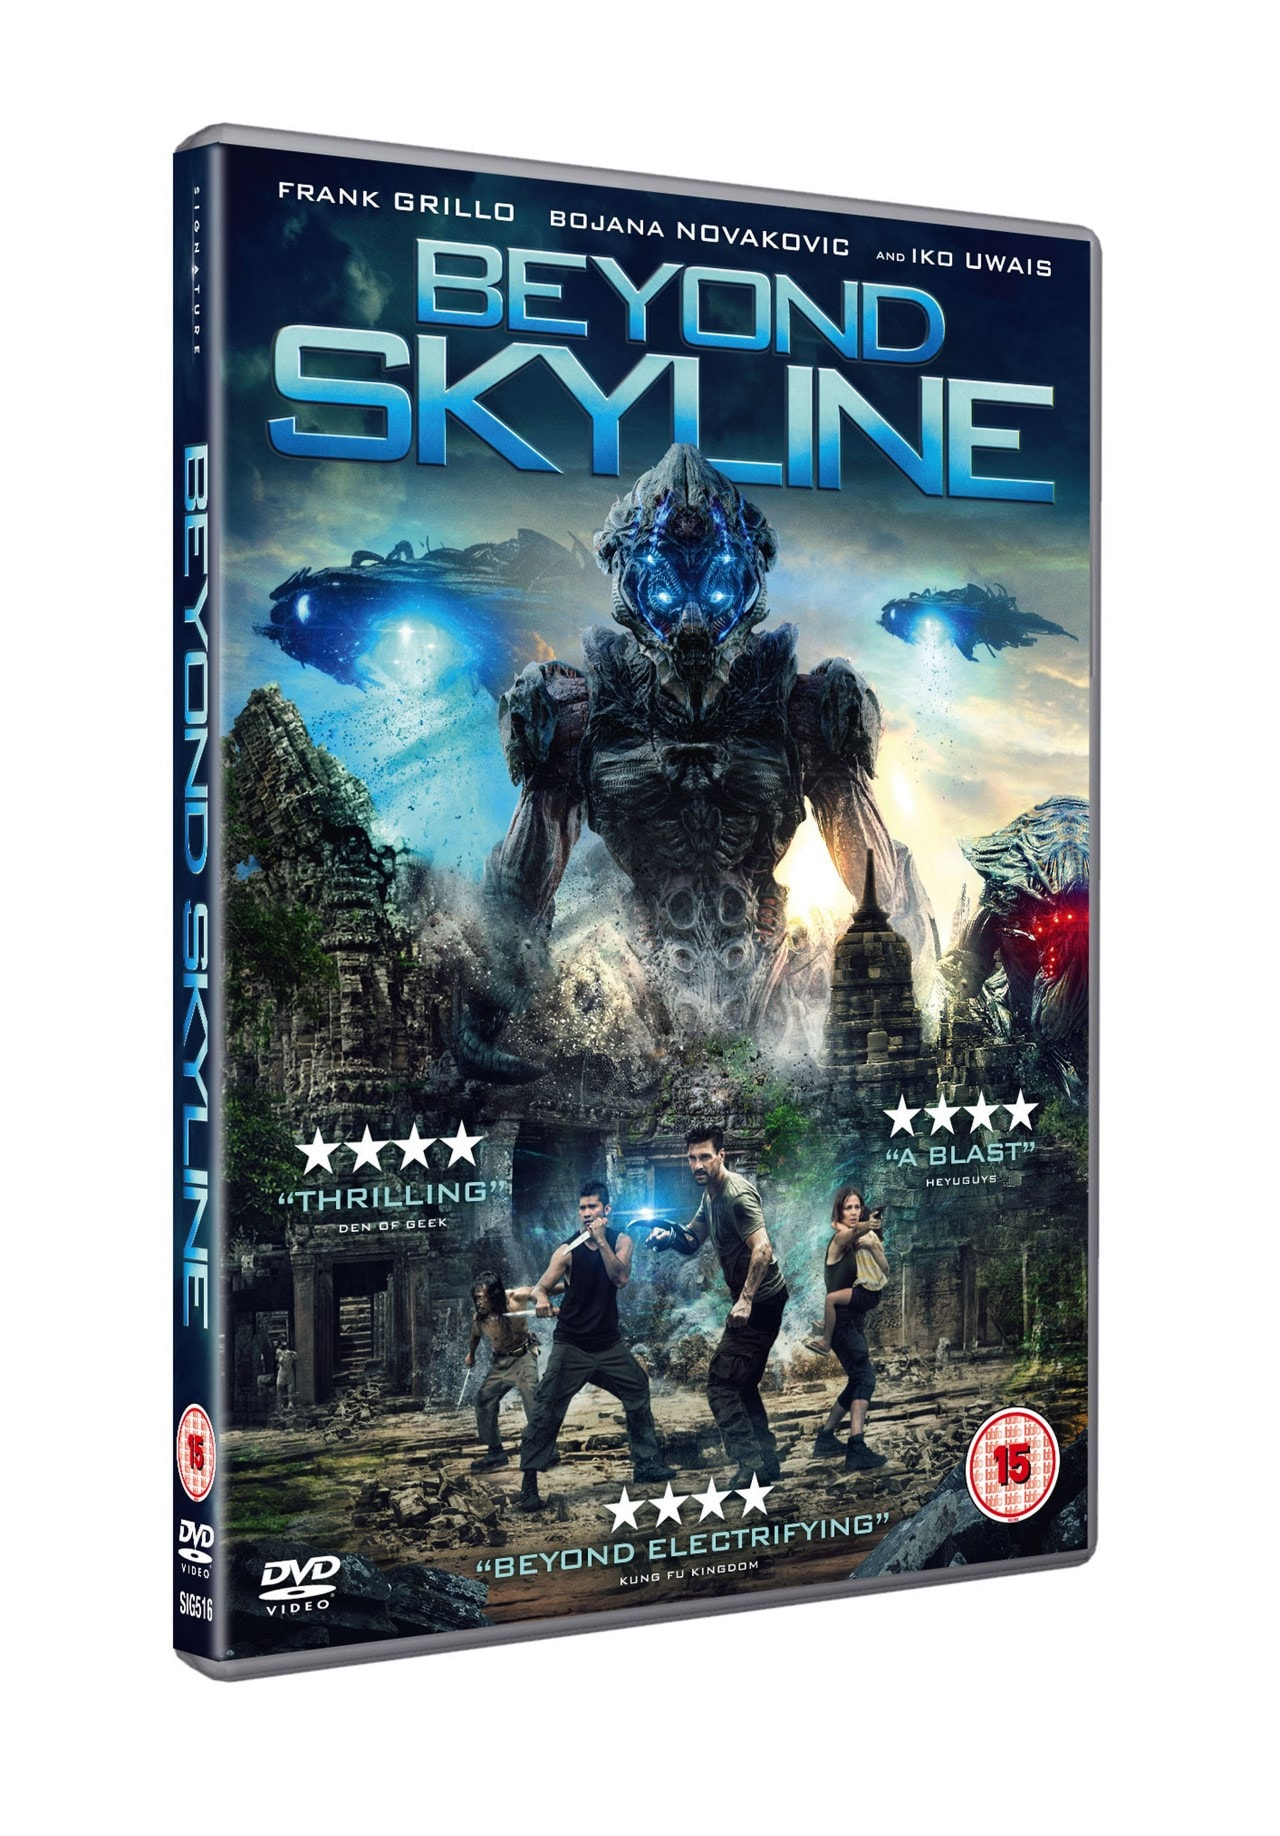 Beyond Skyline   DVD   Free shipping over £20   HMV Store